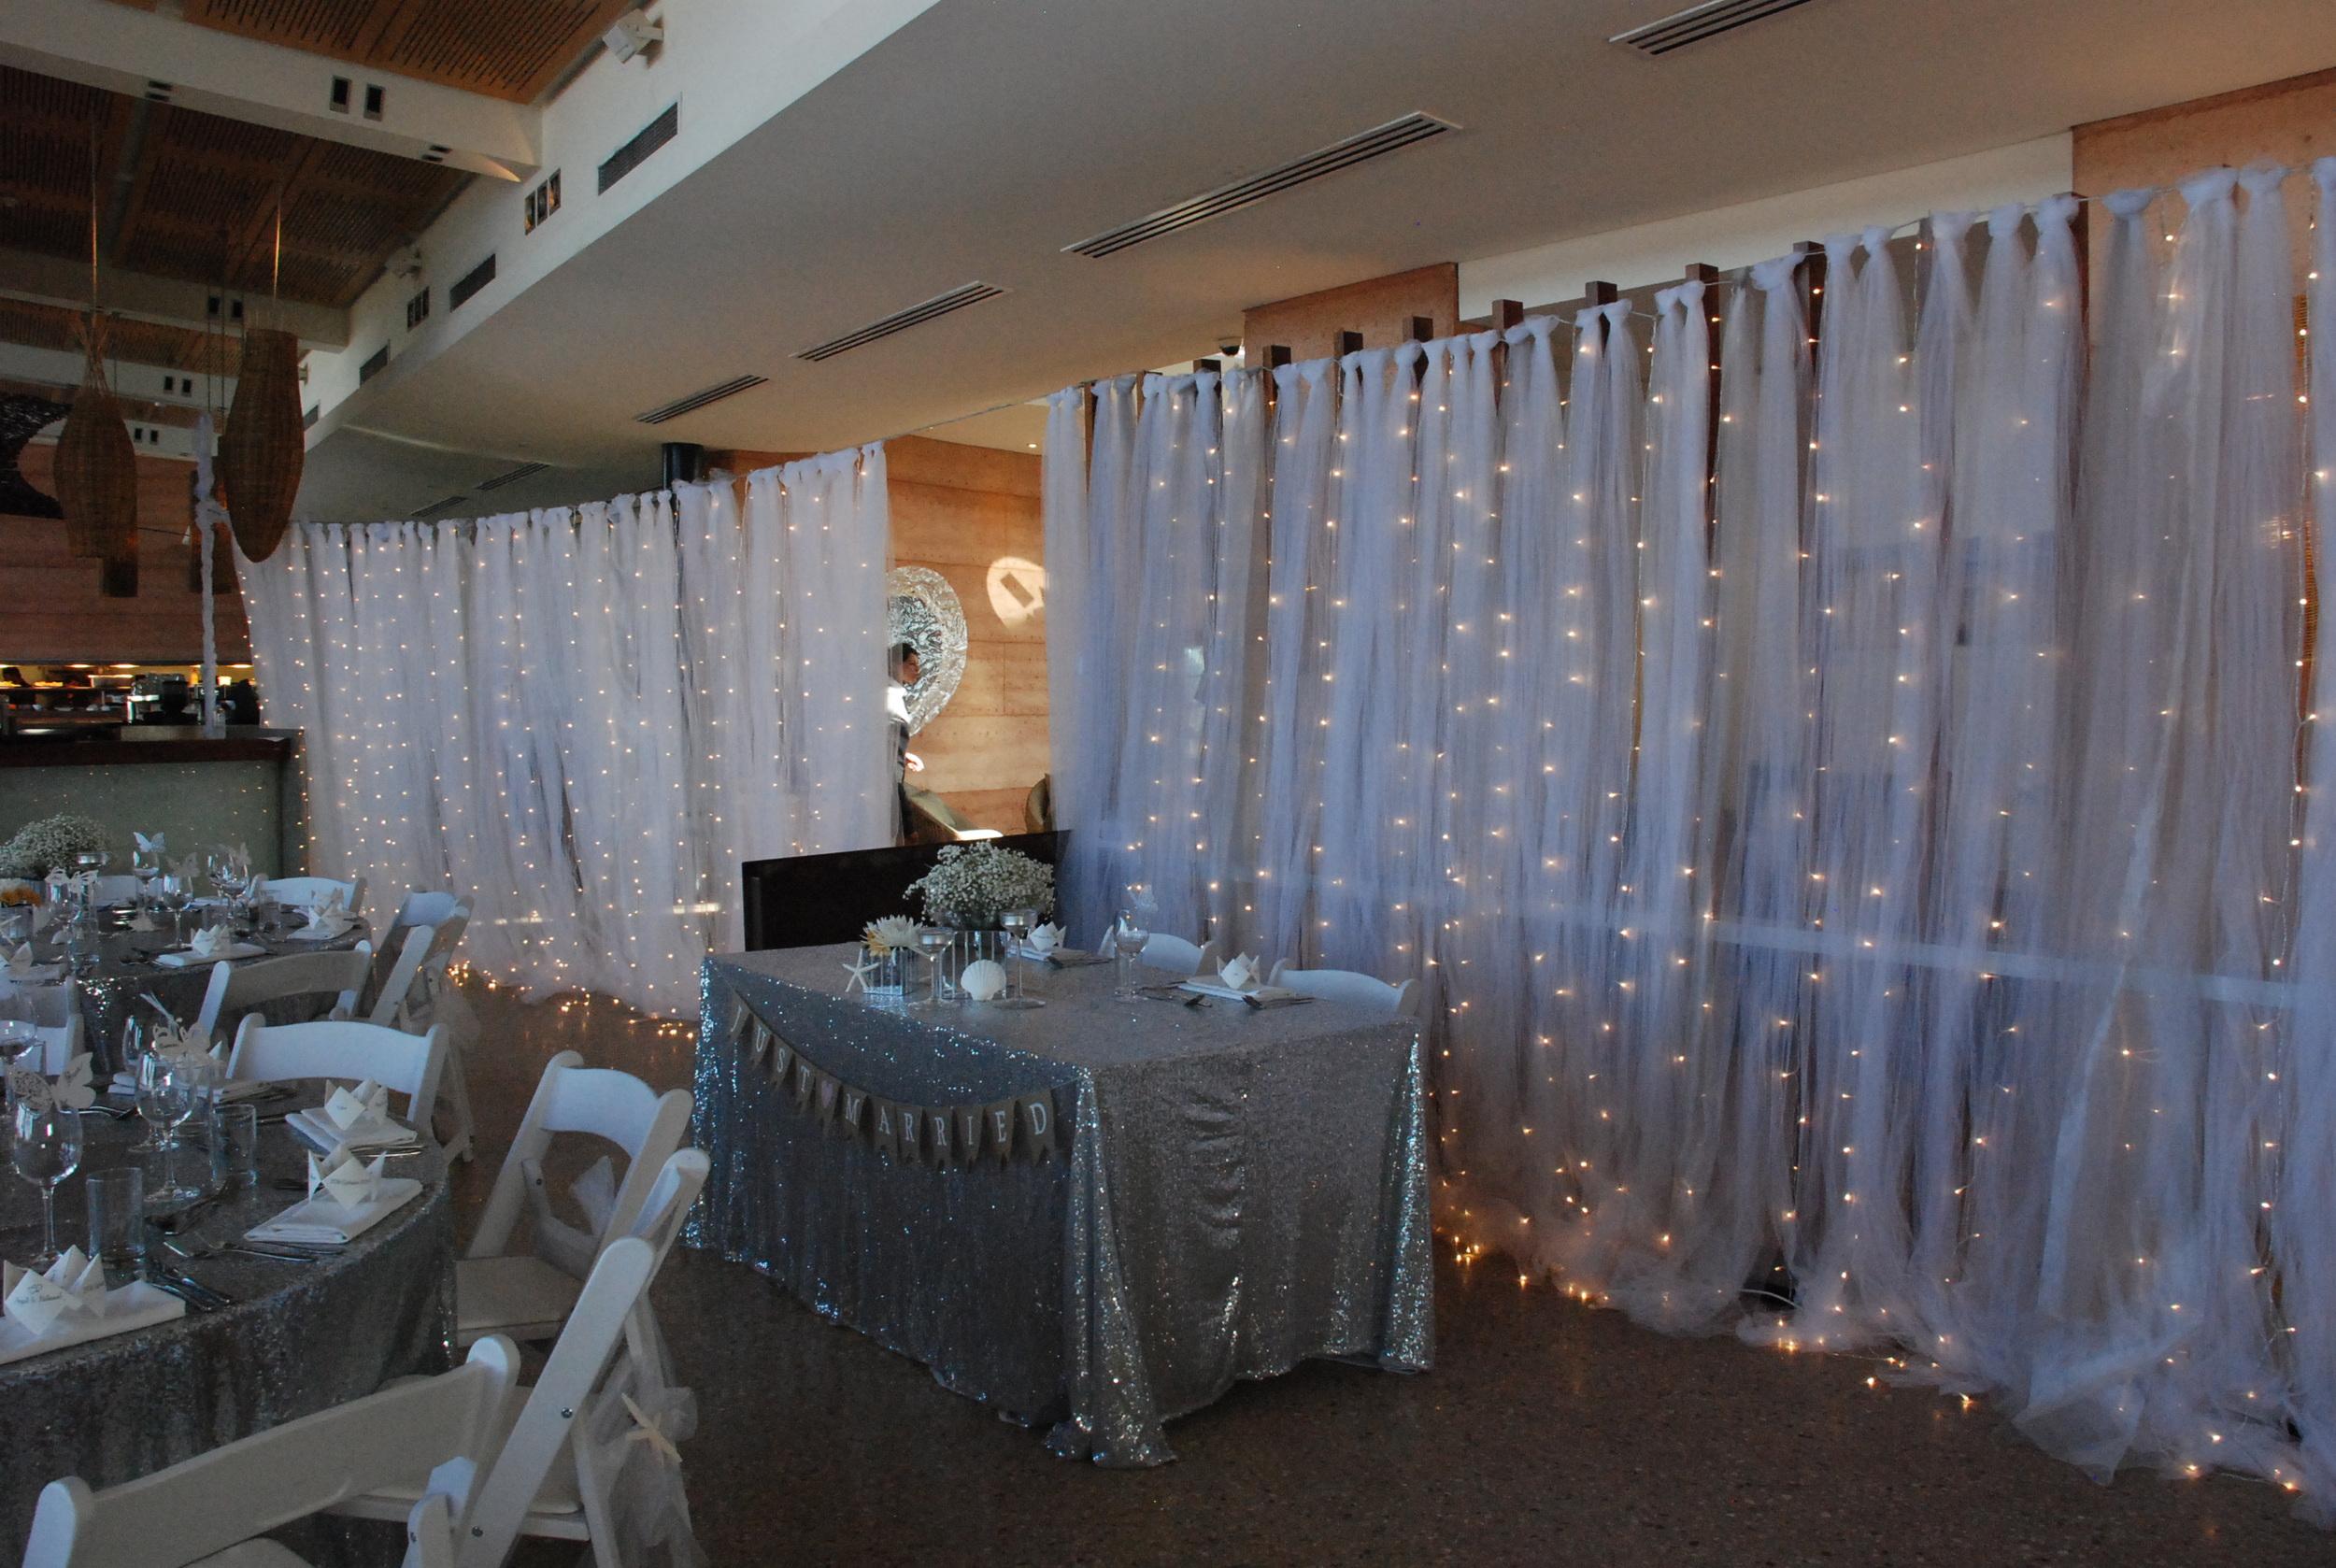 Tulle & Waterfall Fairy Light Divider